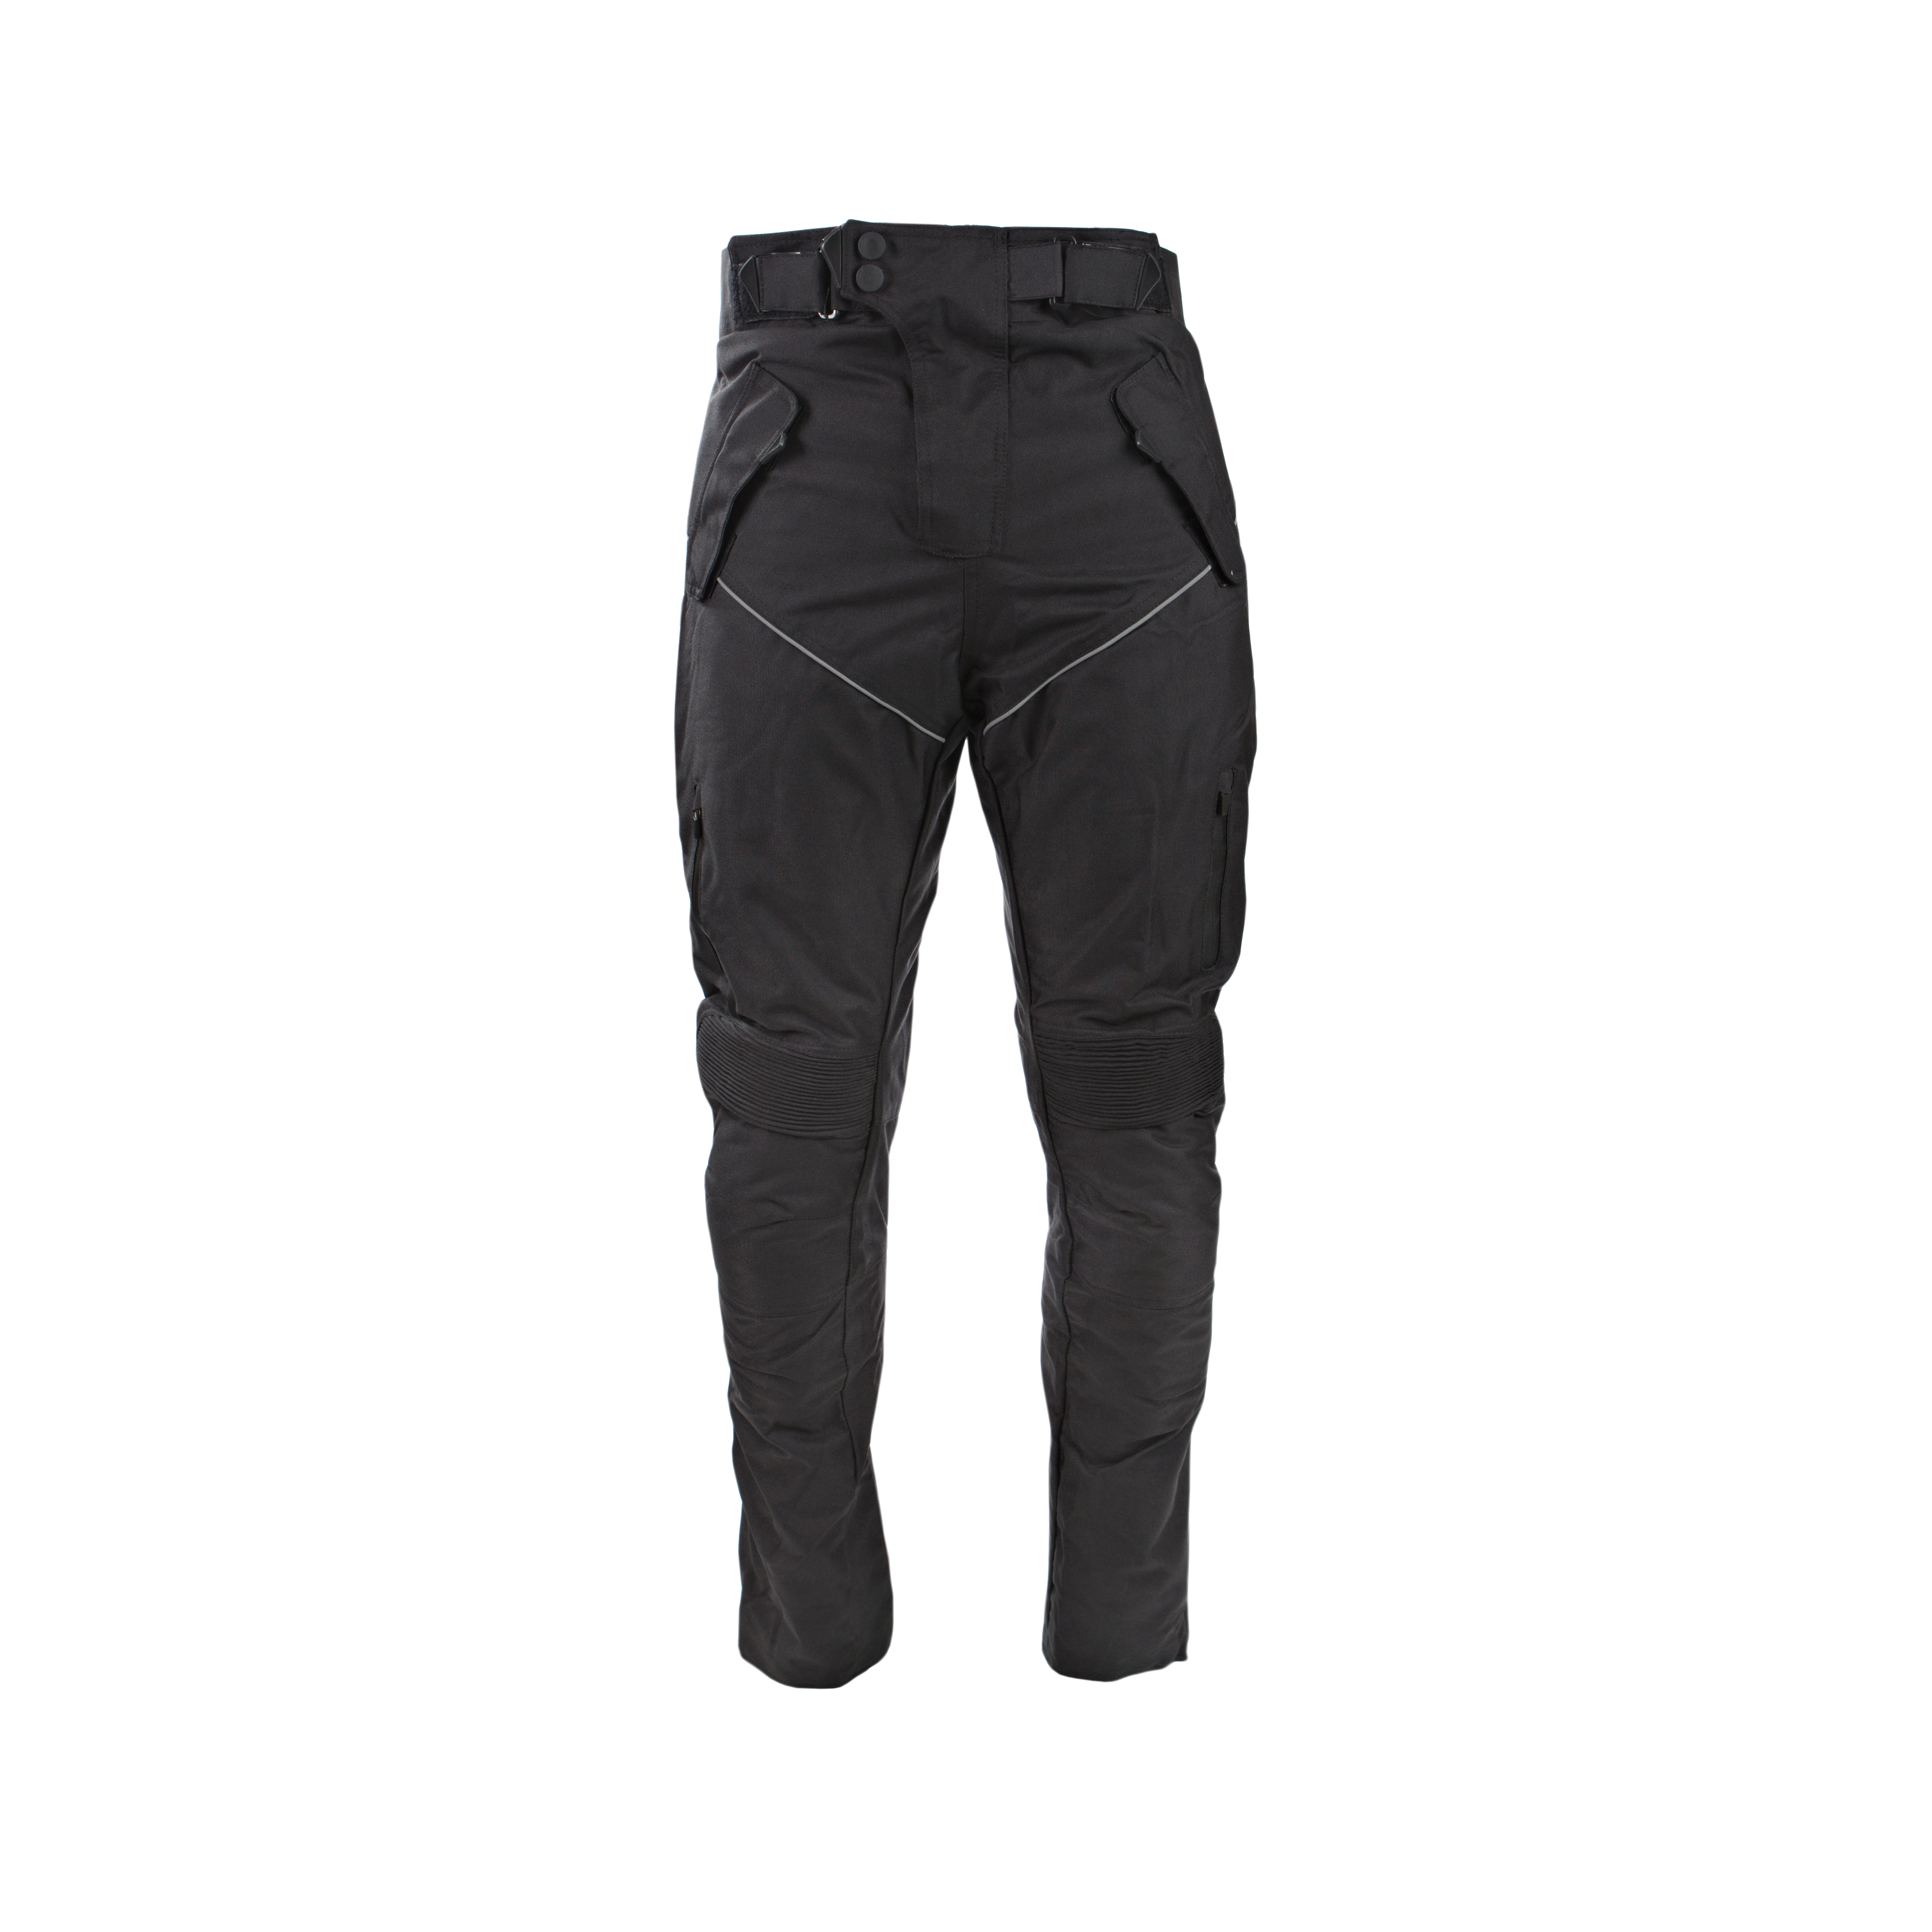 hommes moto textile pantalon renfort ce vent imperm able hiver occasion uk ebay. Black Bedroom Furniture Sets. Home Design Ideas